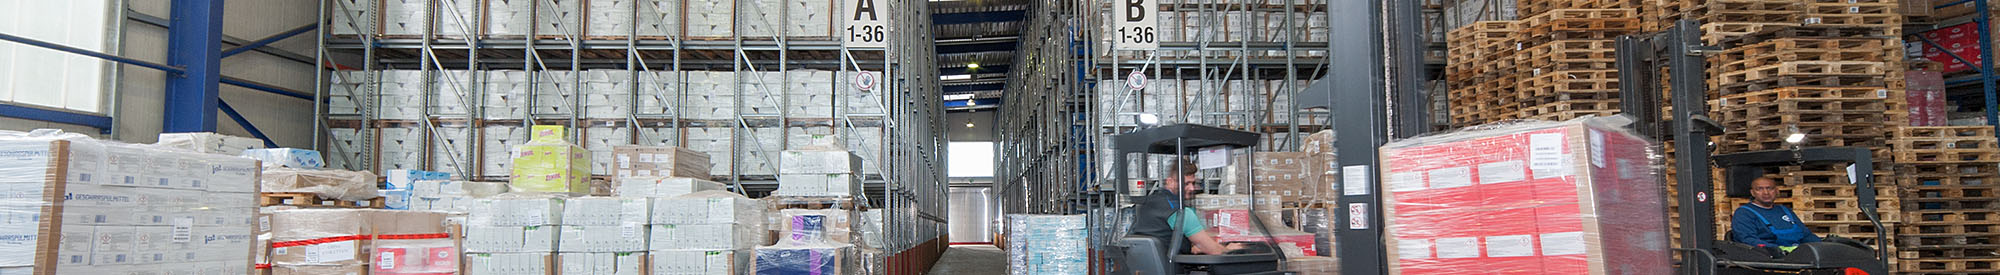 Leistungen - Bock Logistik GmbH & Co. KG